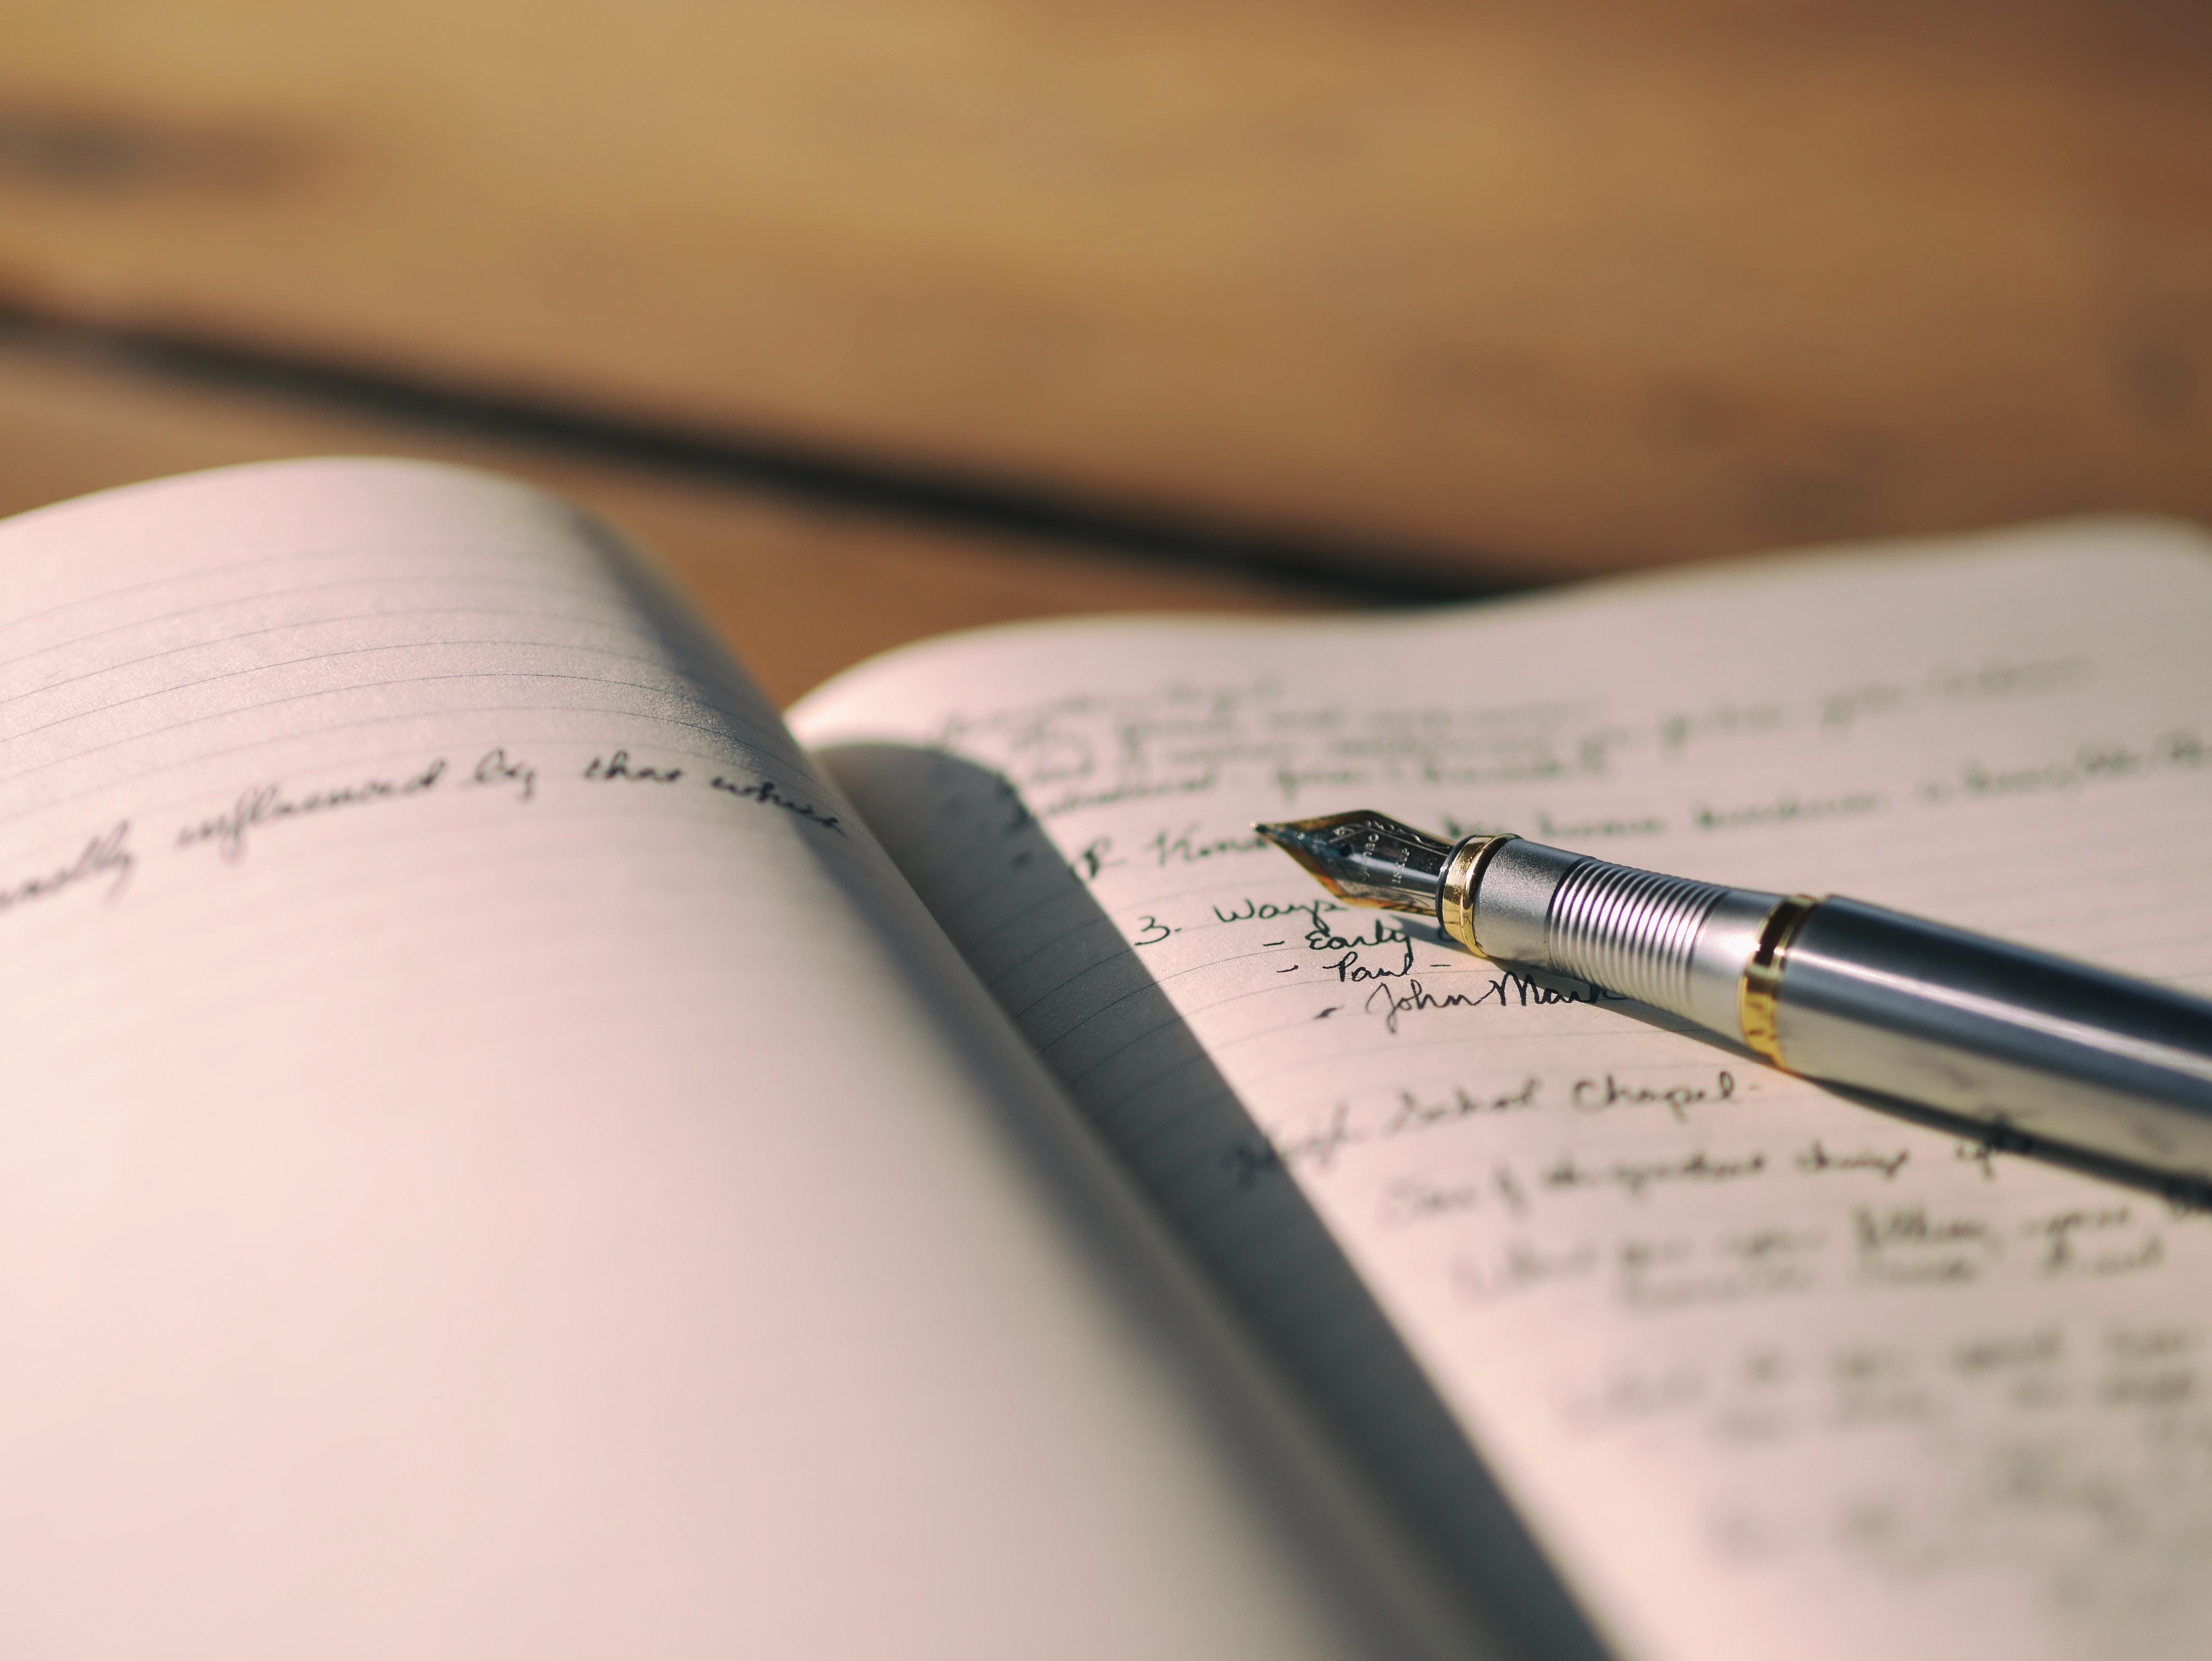 Clichés in Writing